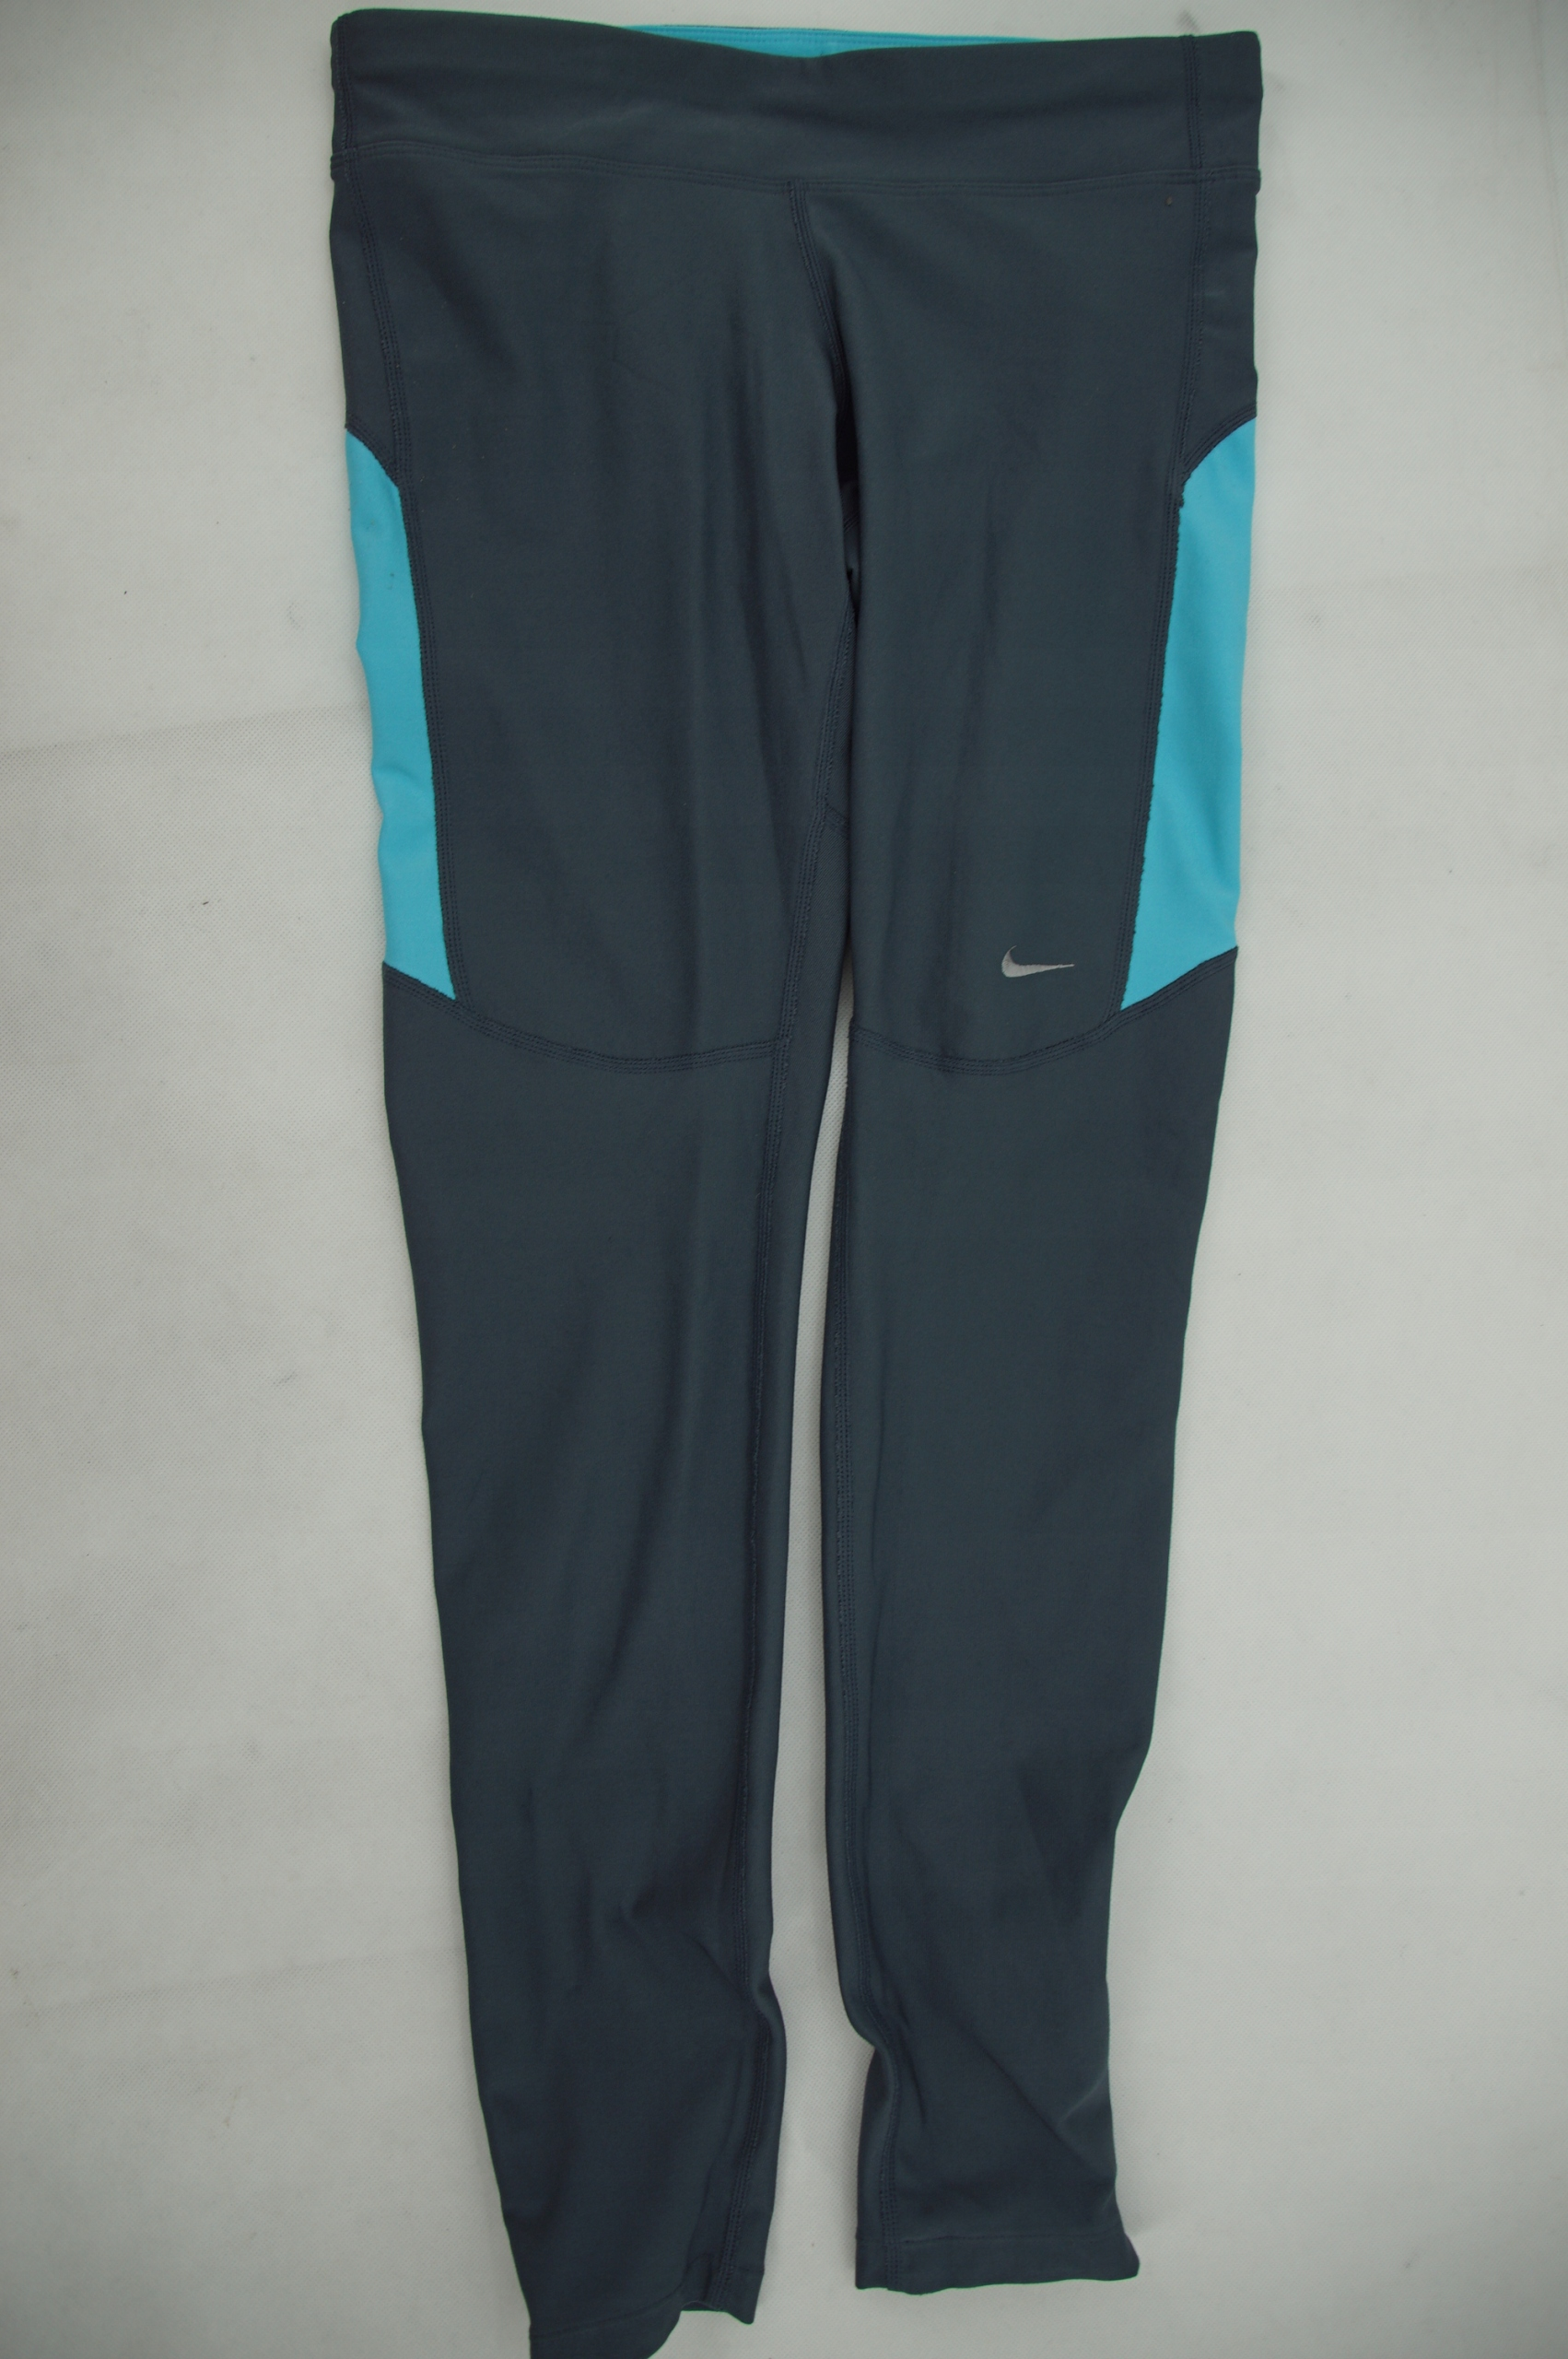 Nike S 36 gerty sportowe legginsy P